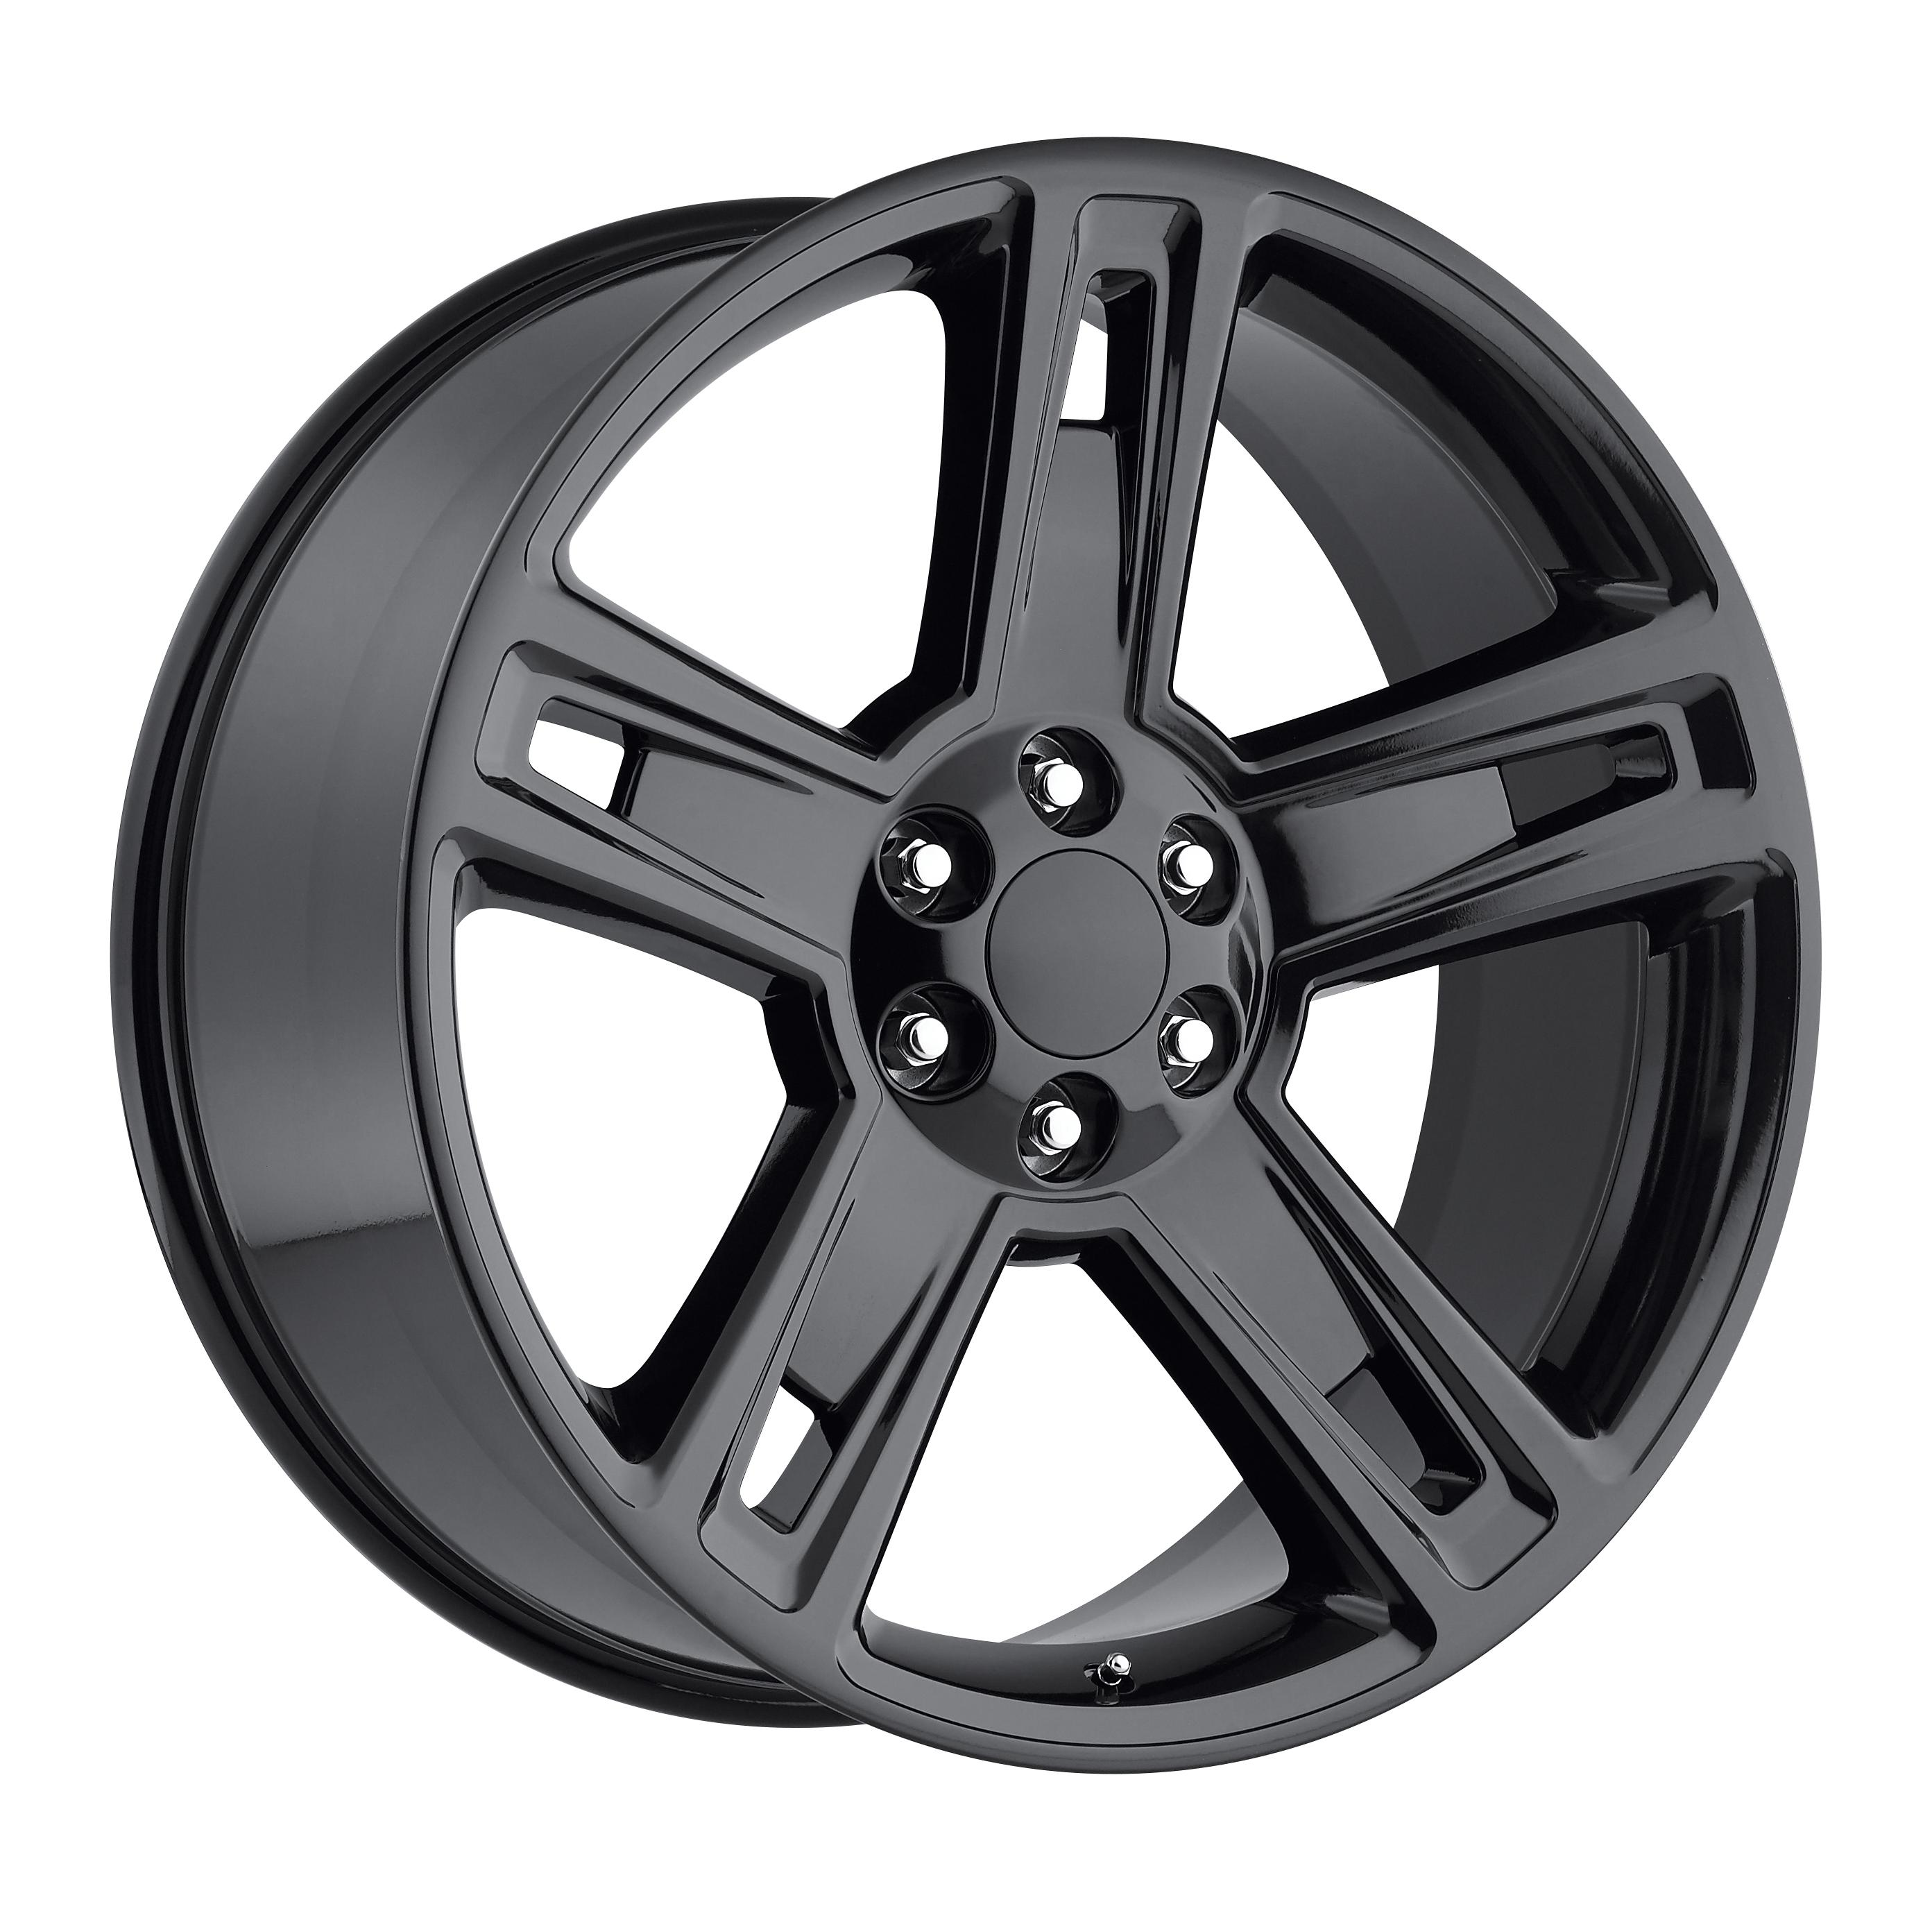 rim stock wheel wheels silverado bbb hol factory chevrolet gloss oem replacement rims used a chevy black